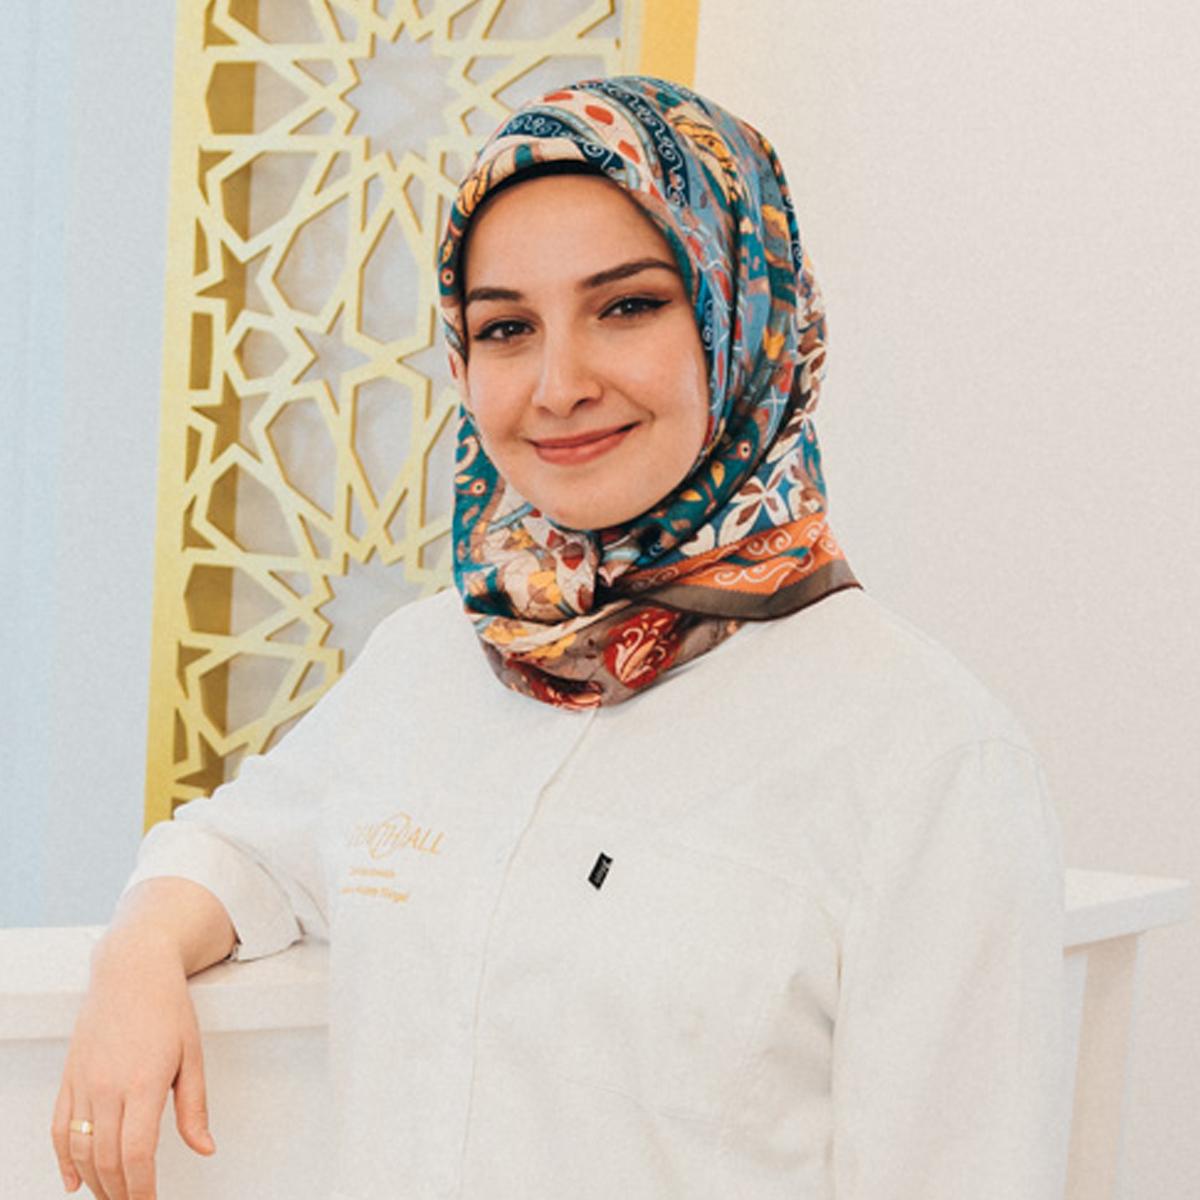 Dr. Hatice Atabey-Töngel